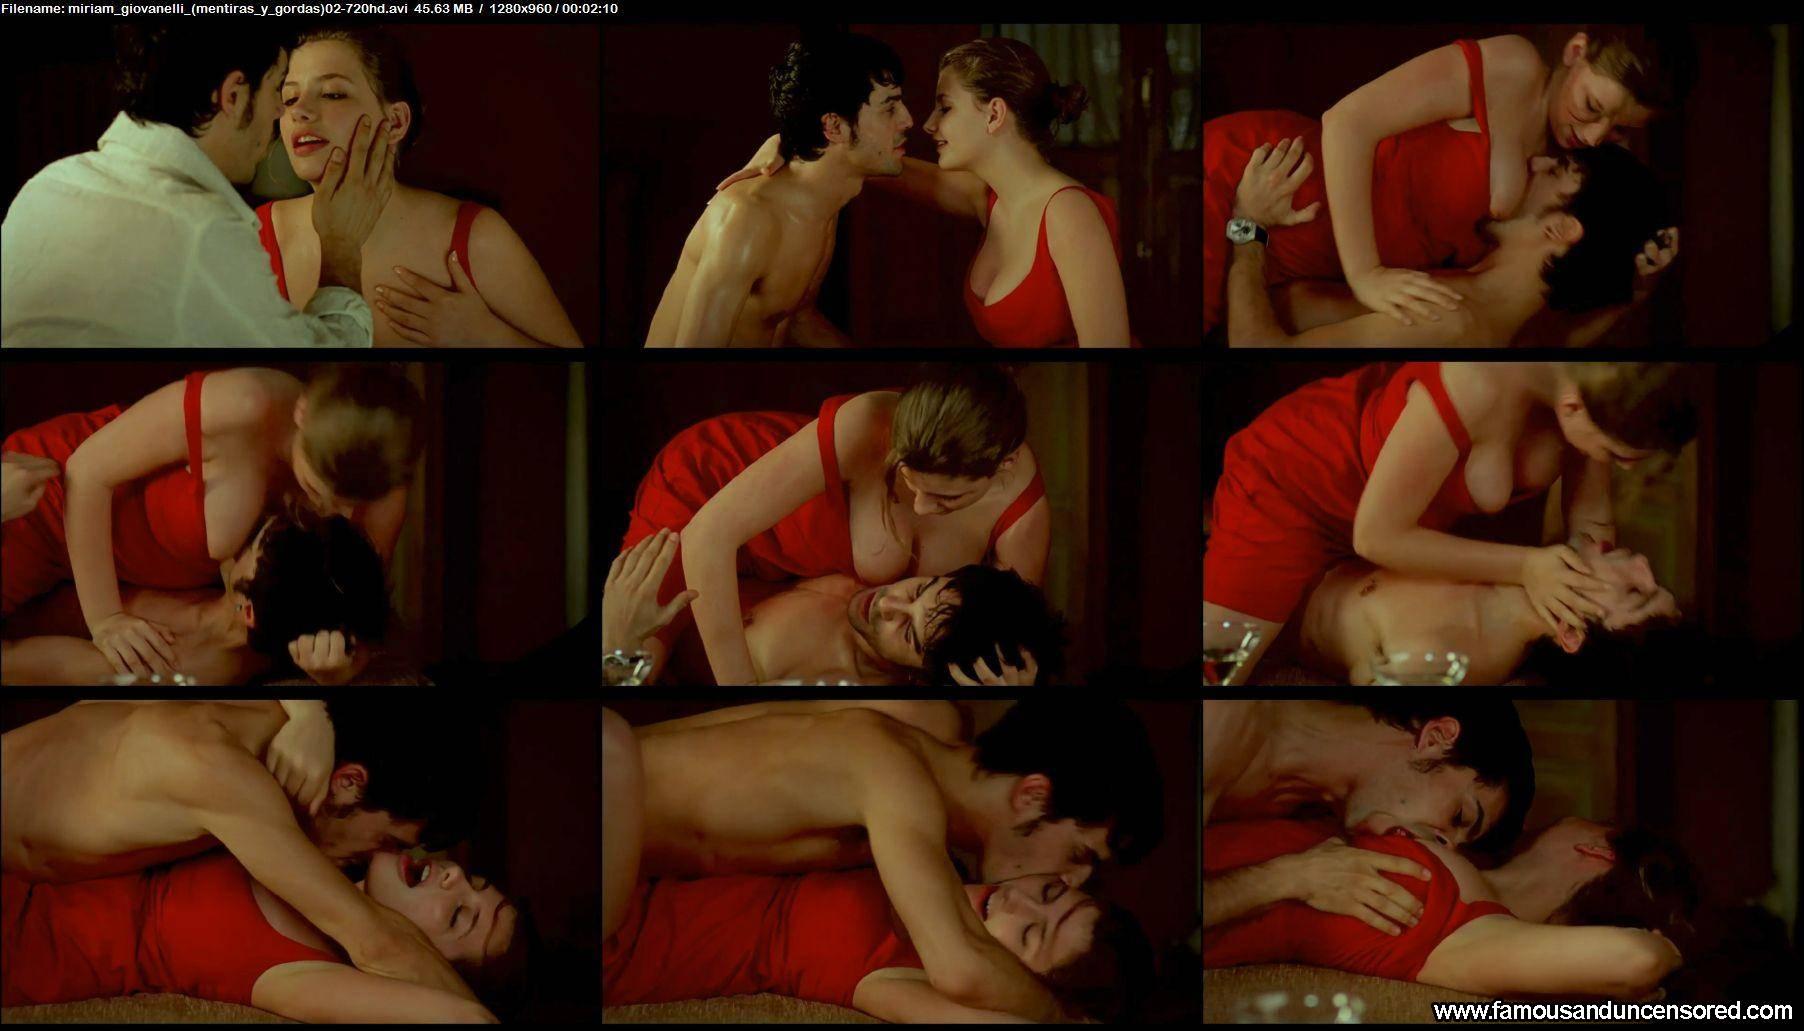 Aguila Roja Fake Porno miriam lahnstein nude fake sex porn images gallery 11592